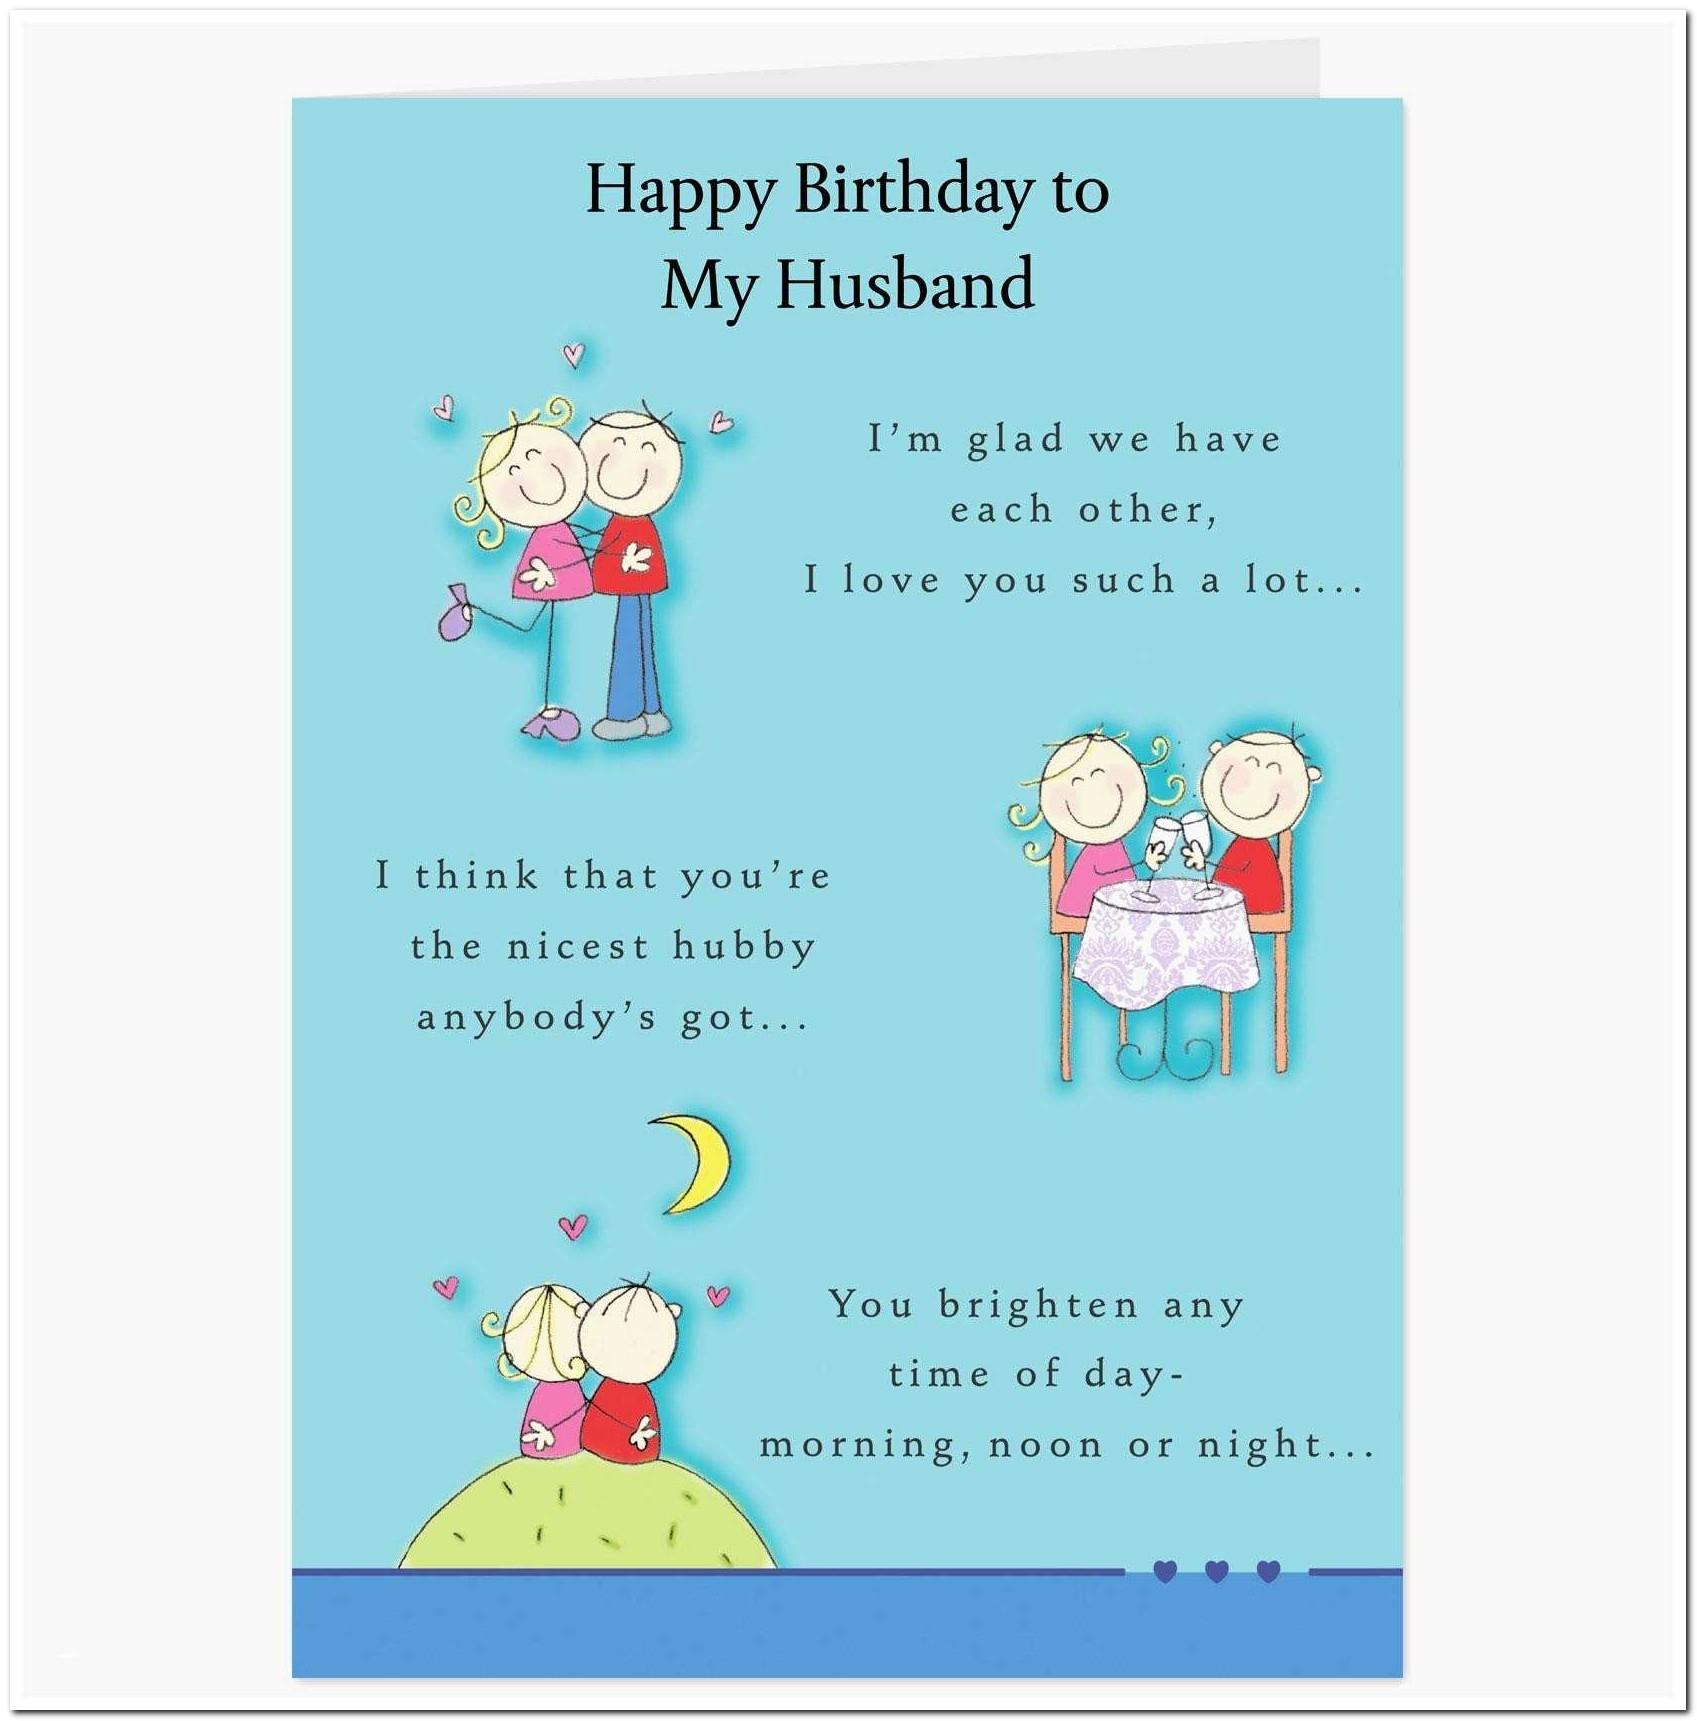 Printable Birthday Cards For Husband Beautiful 20 Elegant Funny - Free Printable Birthday Cards For Husband